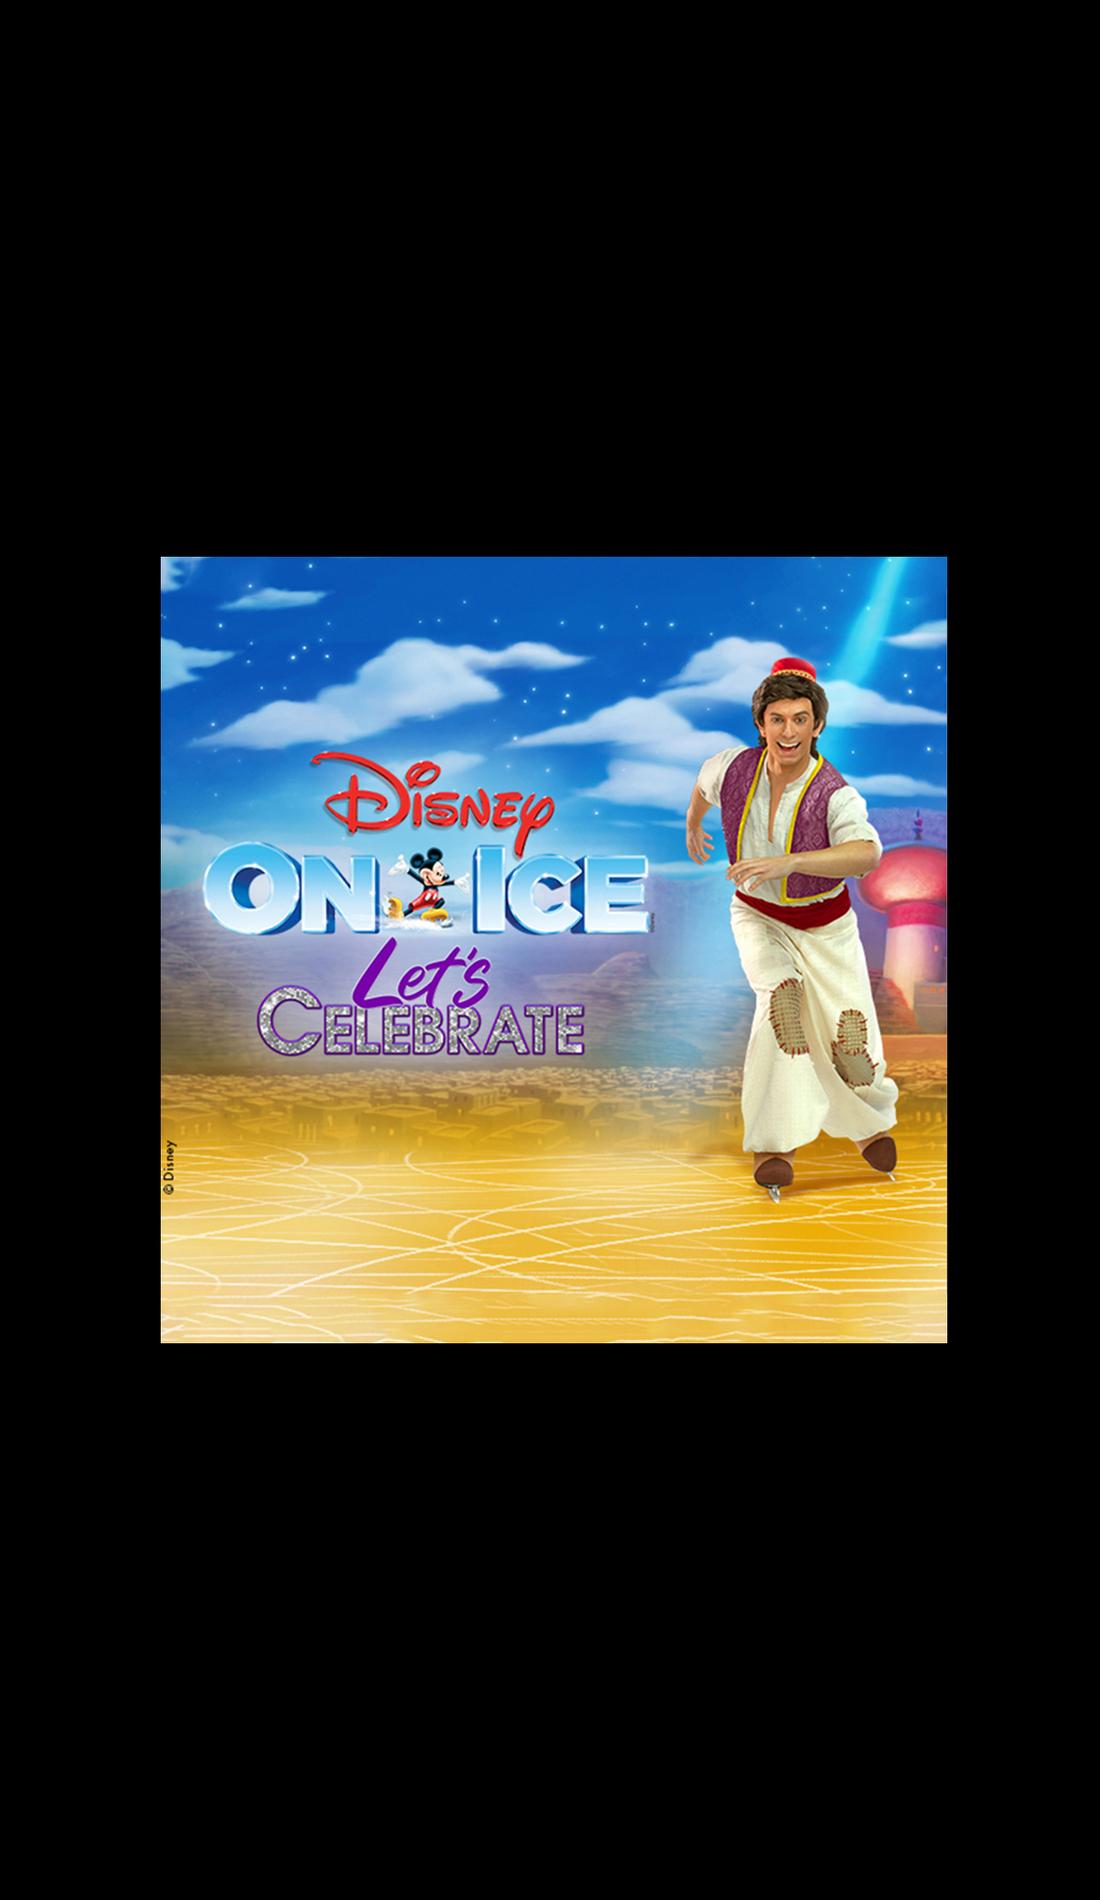 A Disney On Ice Lets Celebrate live event